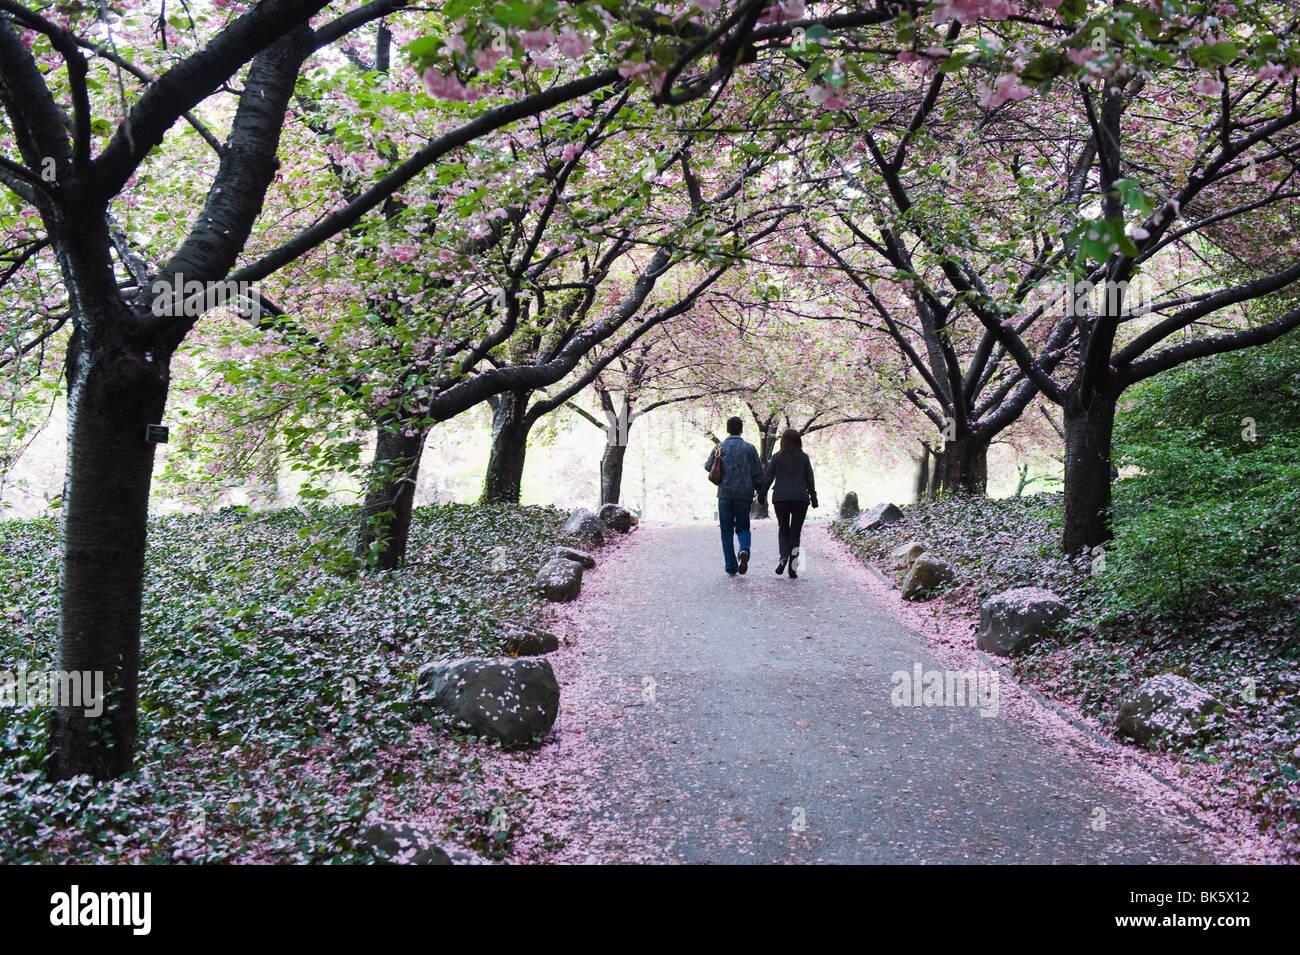 Spring Cherry Blossom Brooklyn Botanical Garden Brooklyn New York Stock Photo Royalty Free